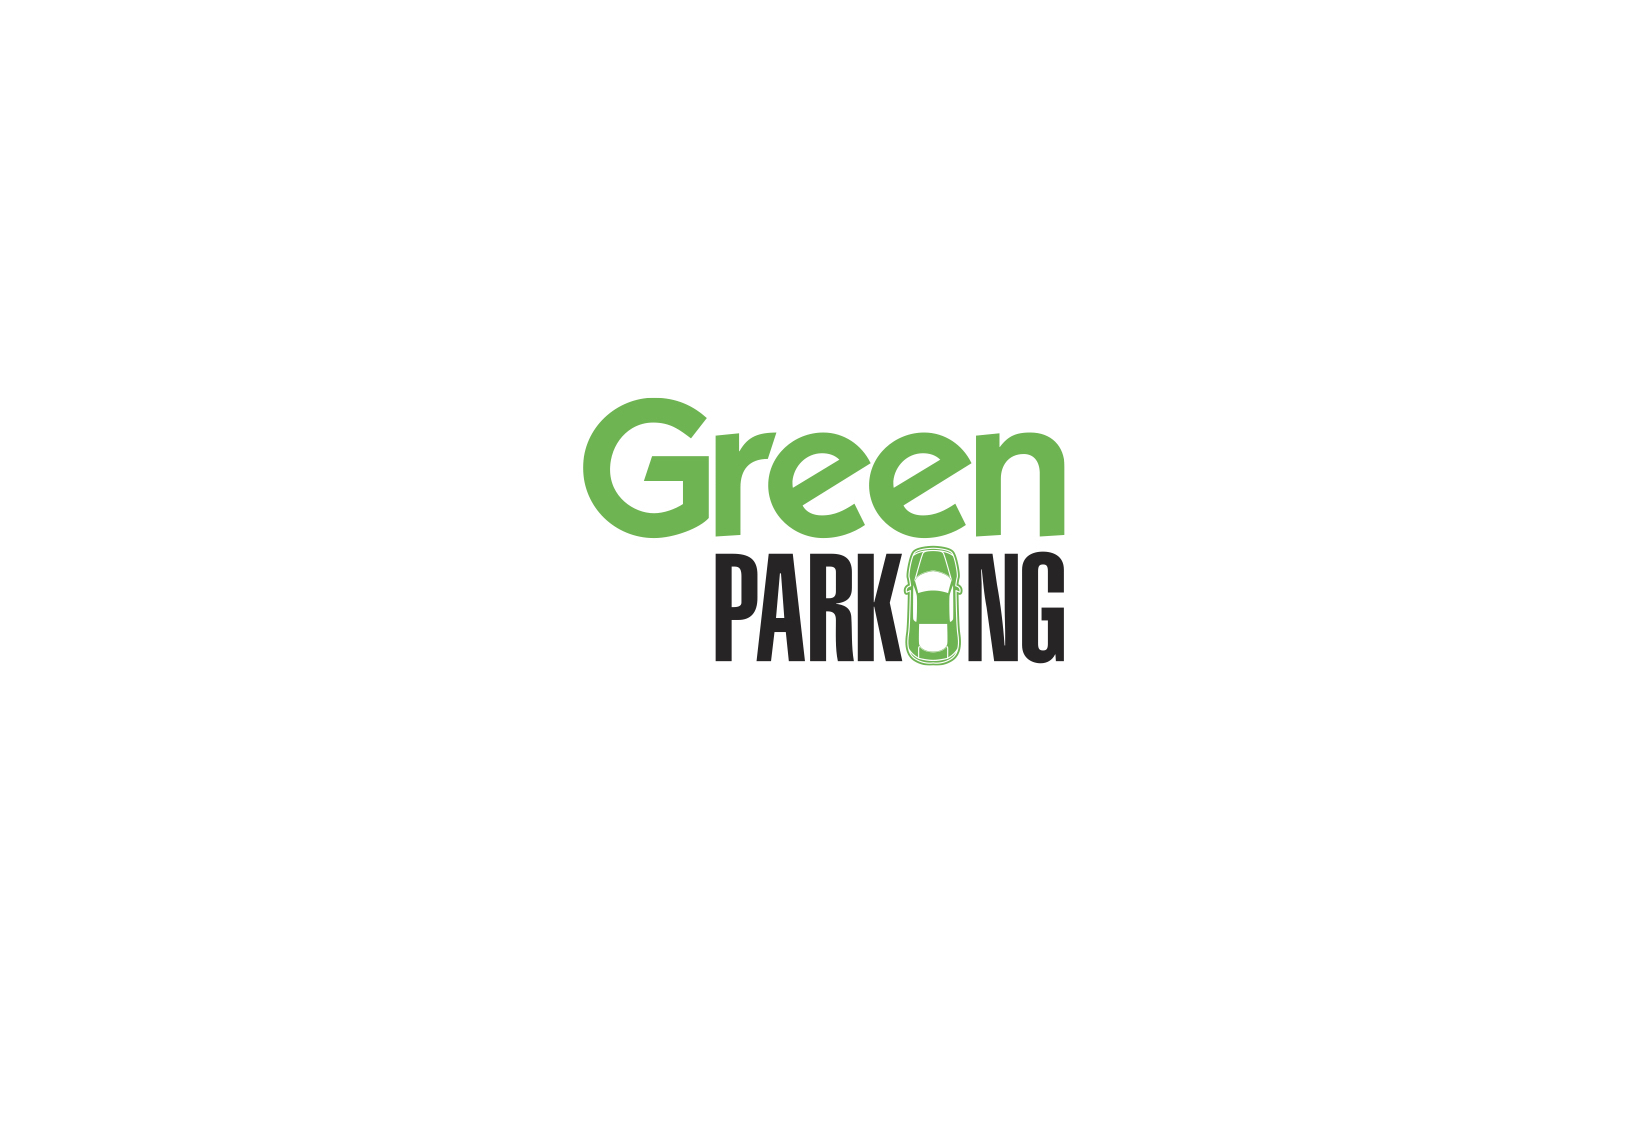 Guaranteed Best Parking Spot Locations